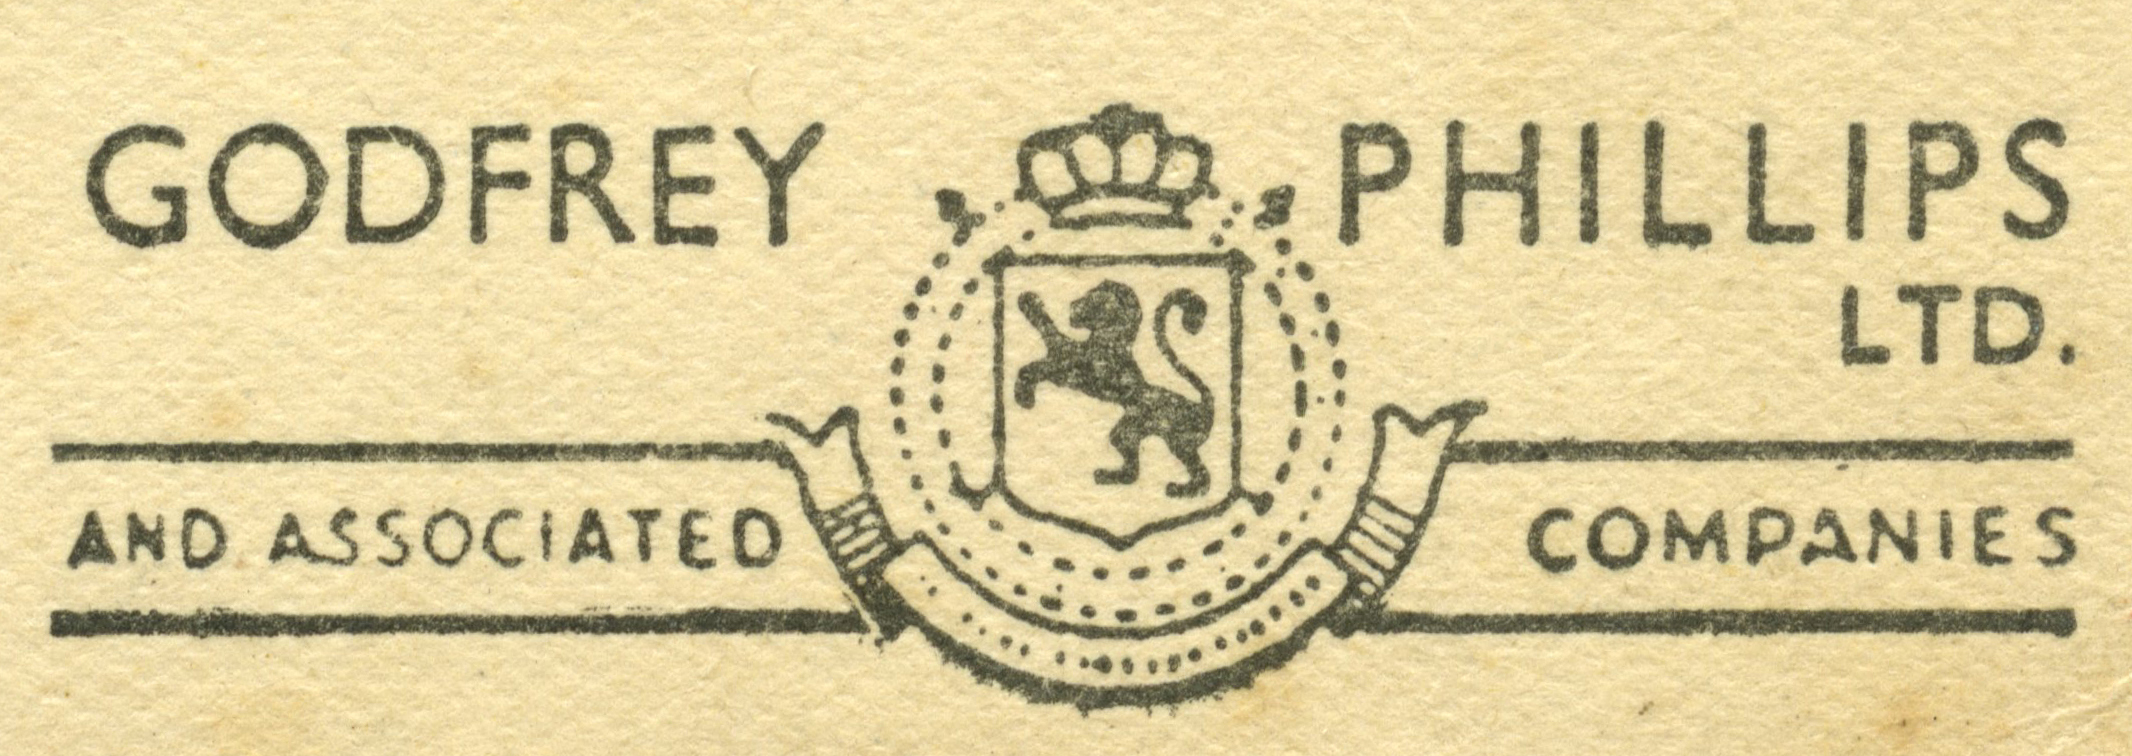 Godfrey Philips, Ltd. Advertising Information